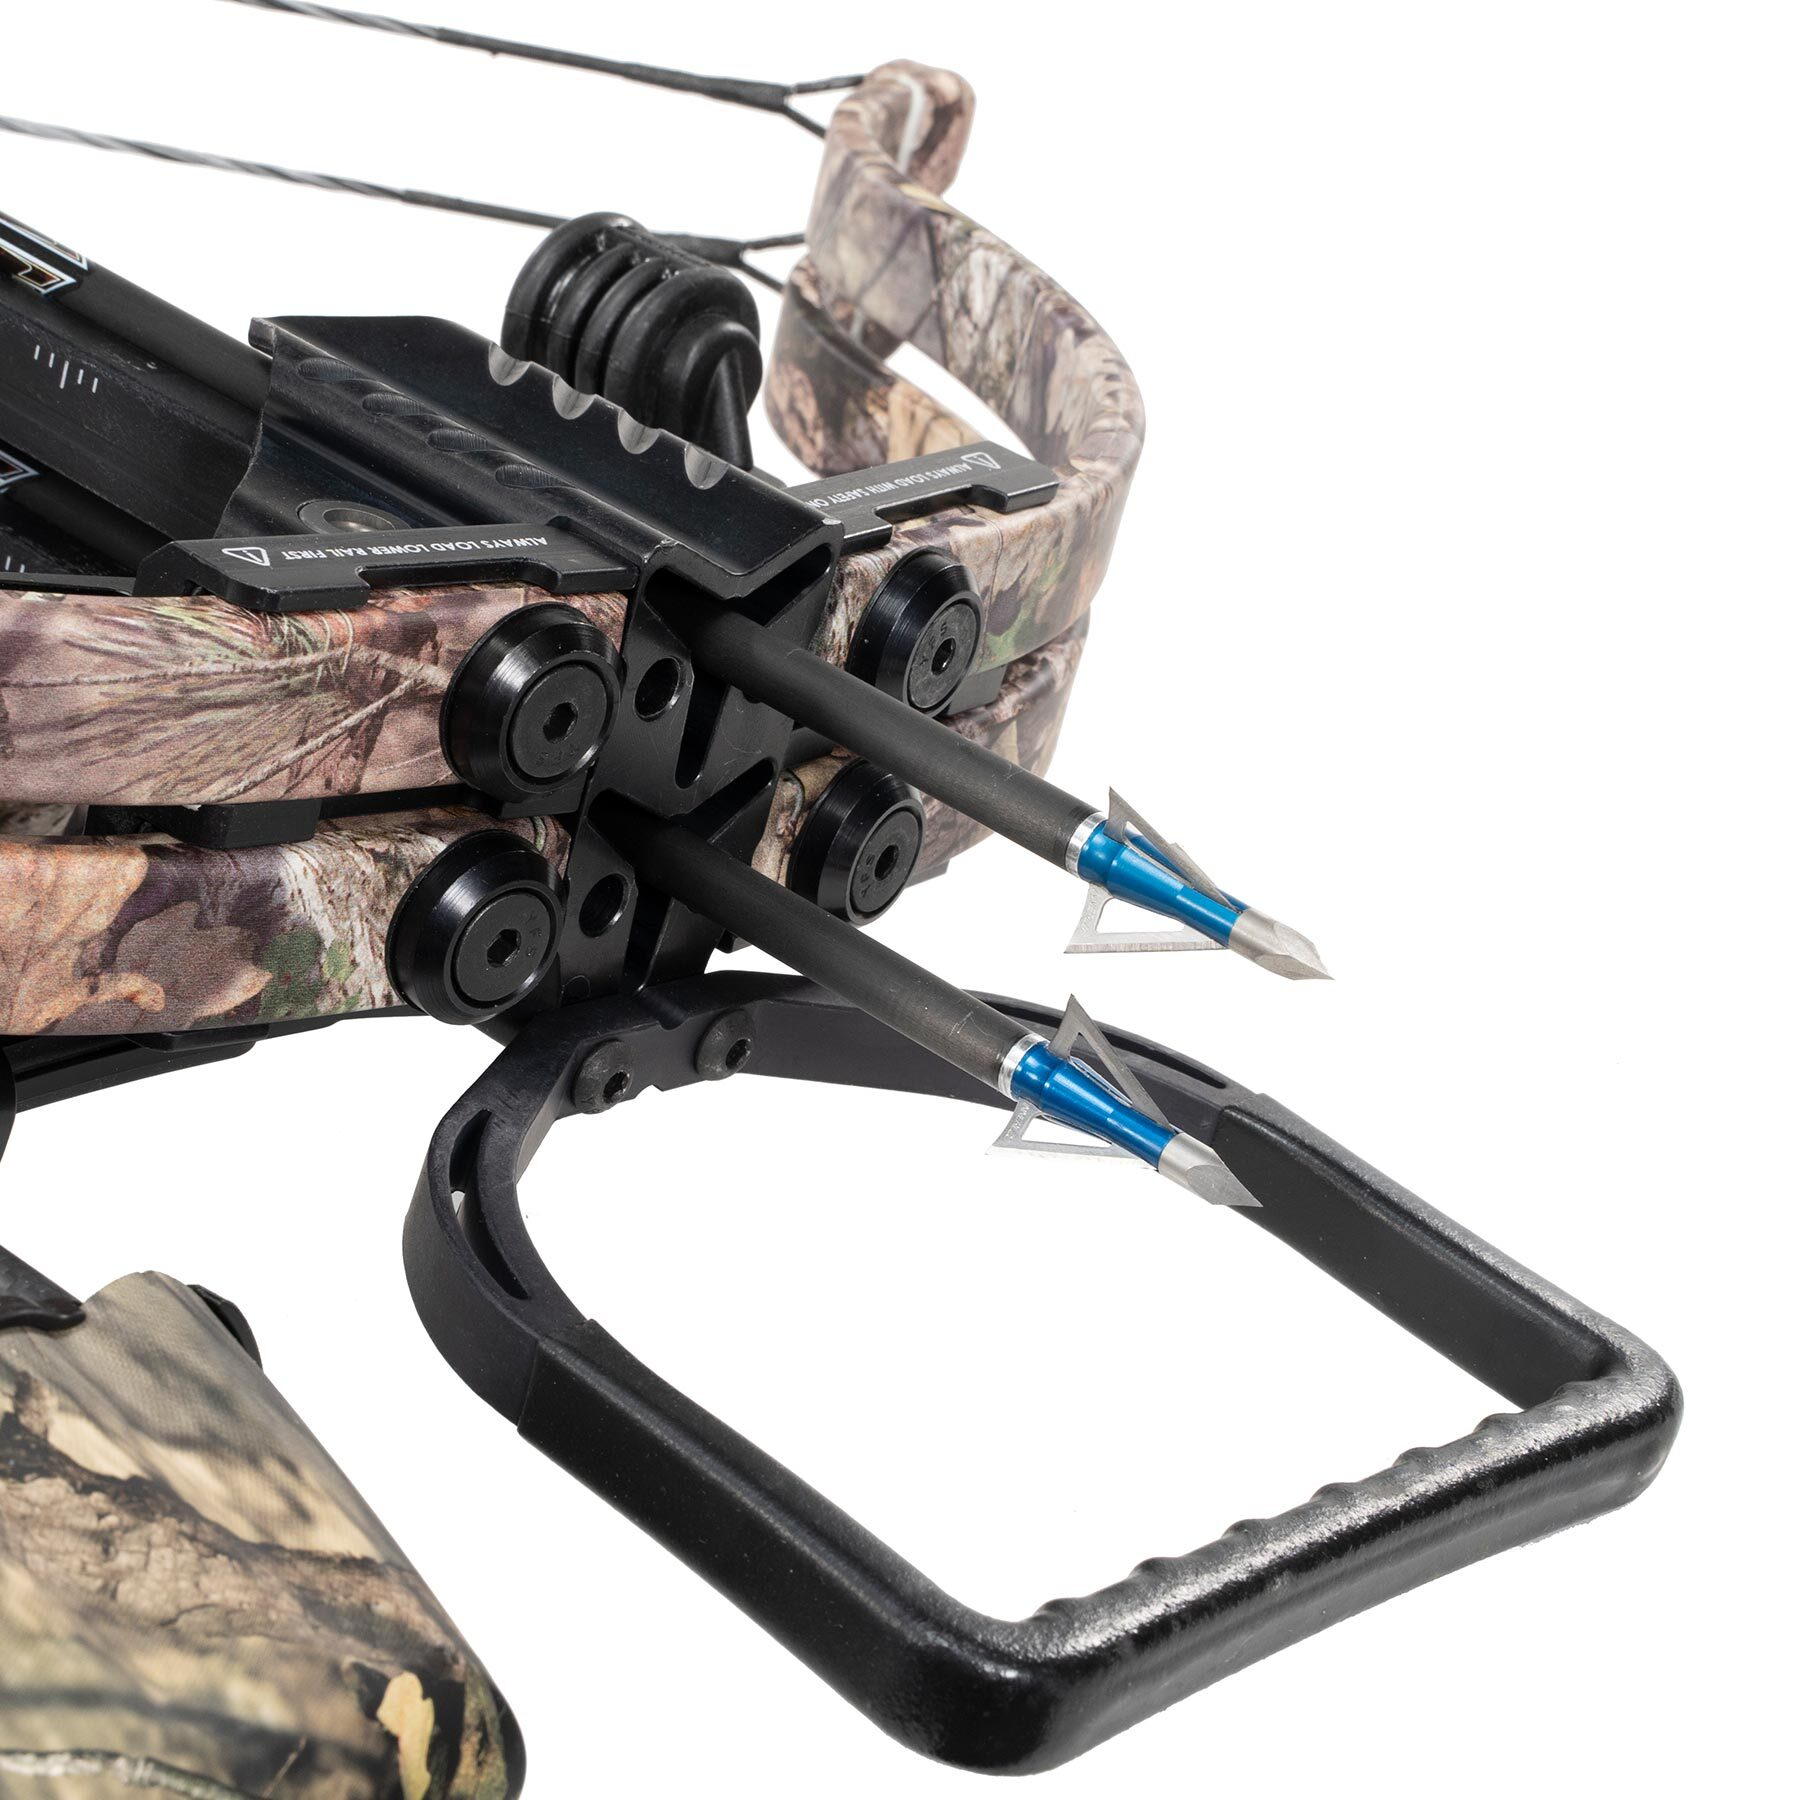 TwinStrike crossbow in Breakup Country camo